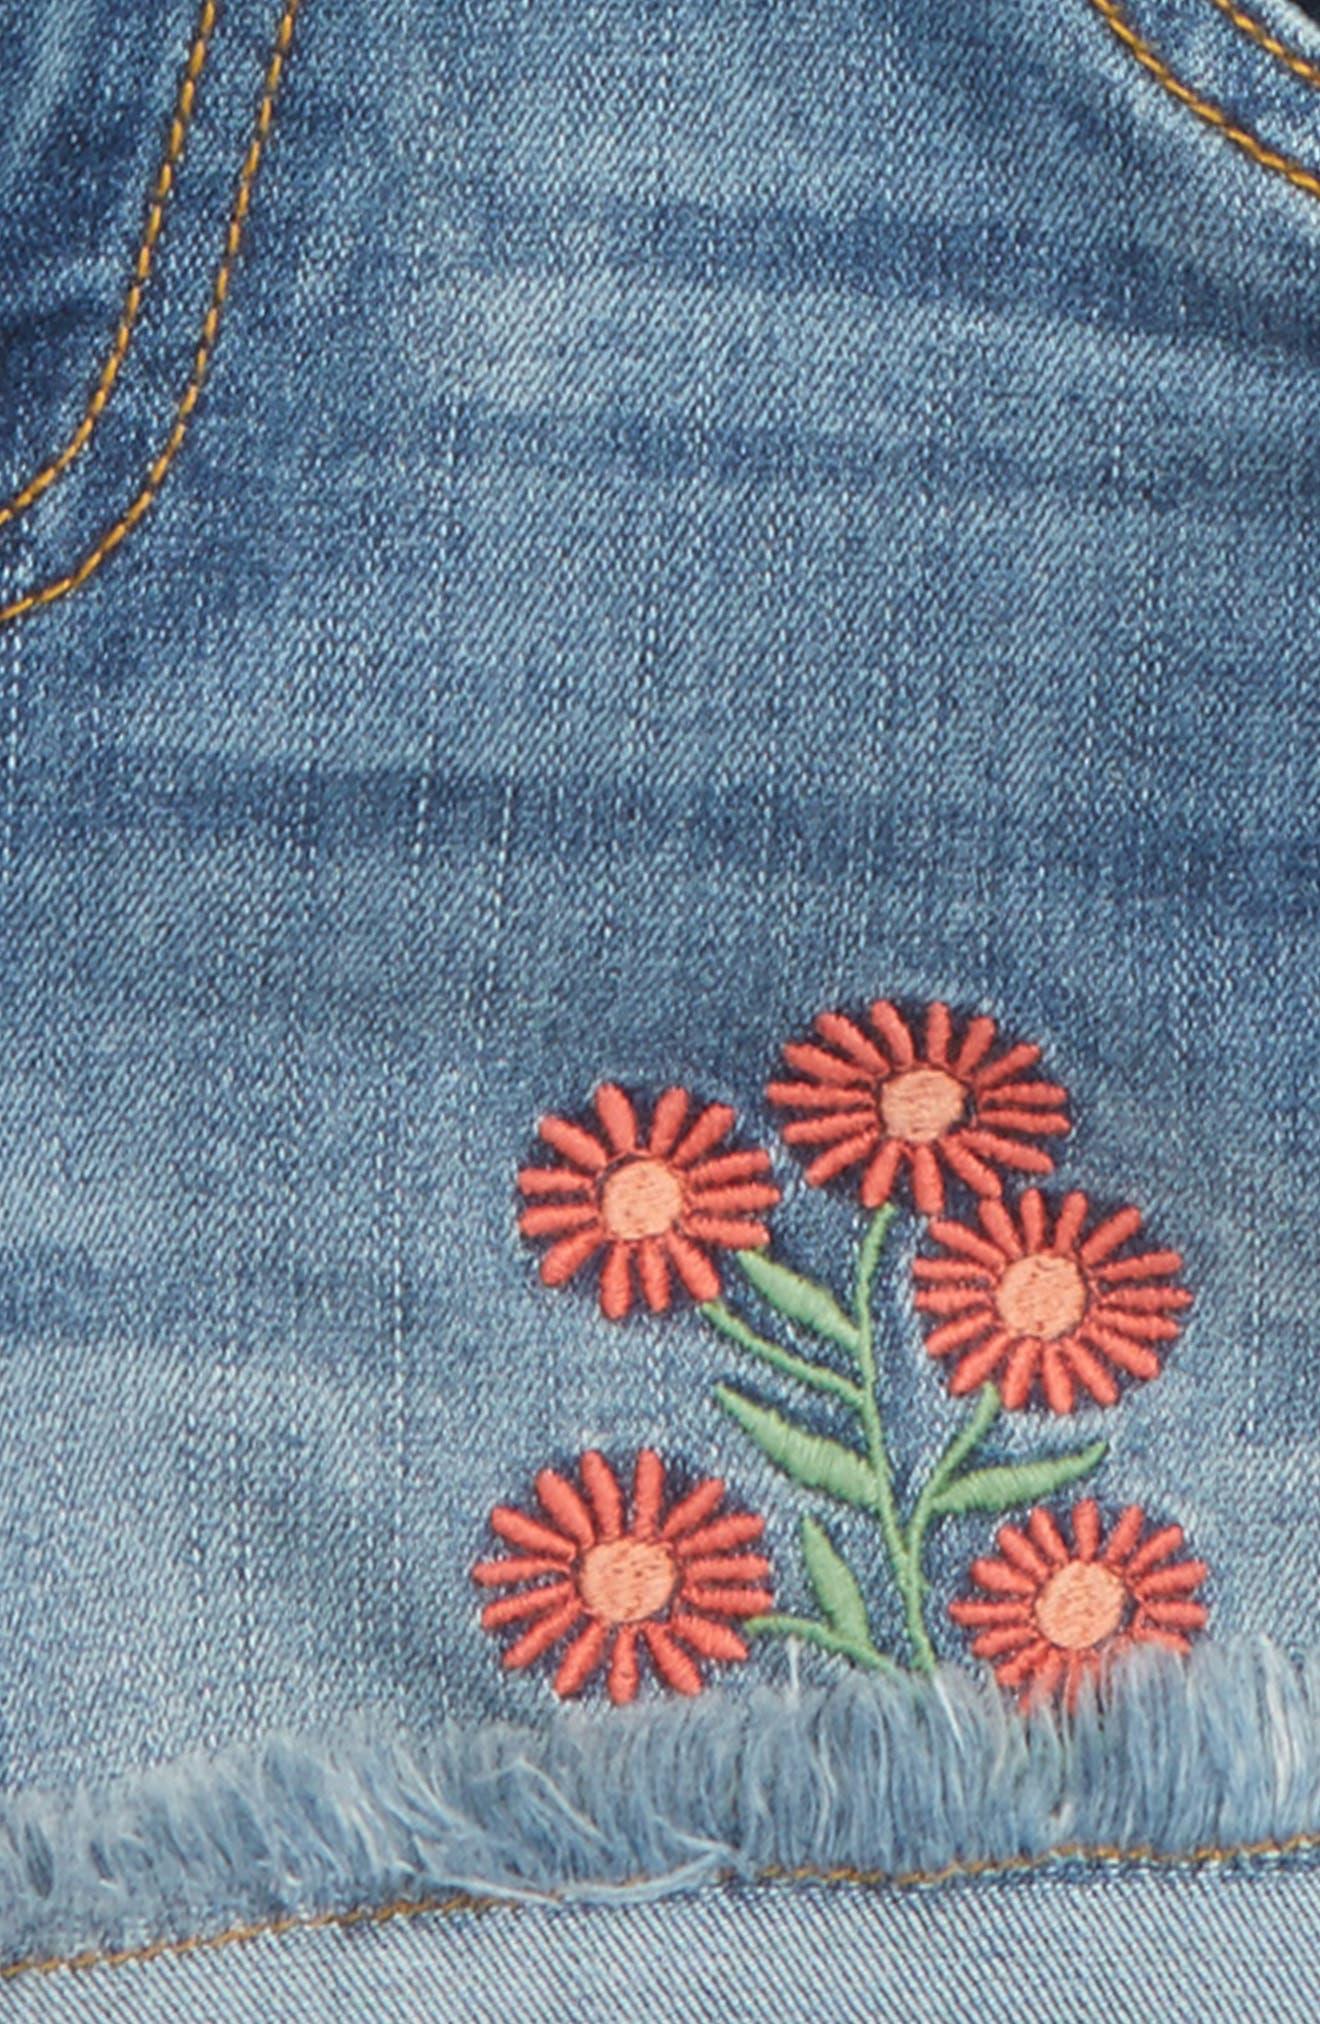 Flower Embroidered Denim Shorts,                             Alternate thumbnail 3, color,                             450